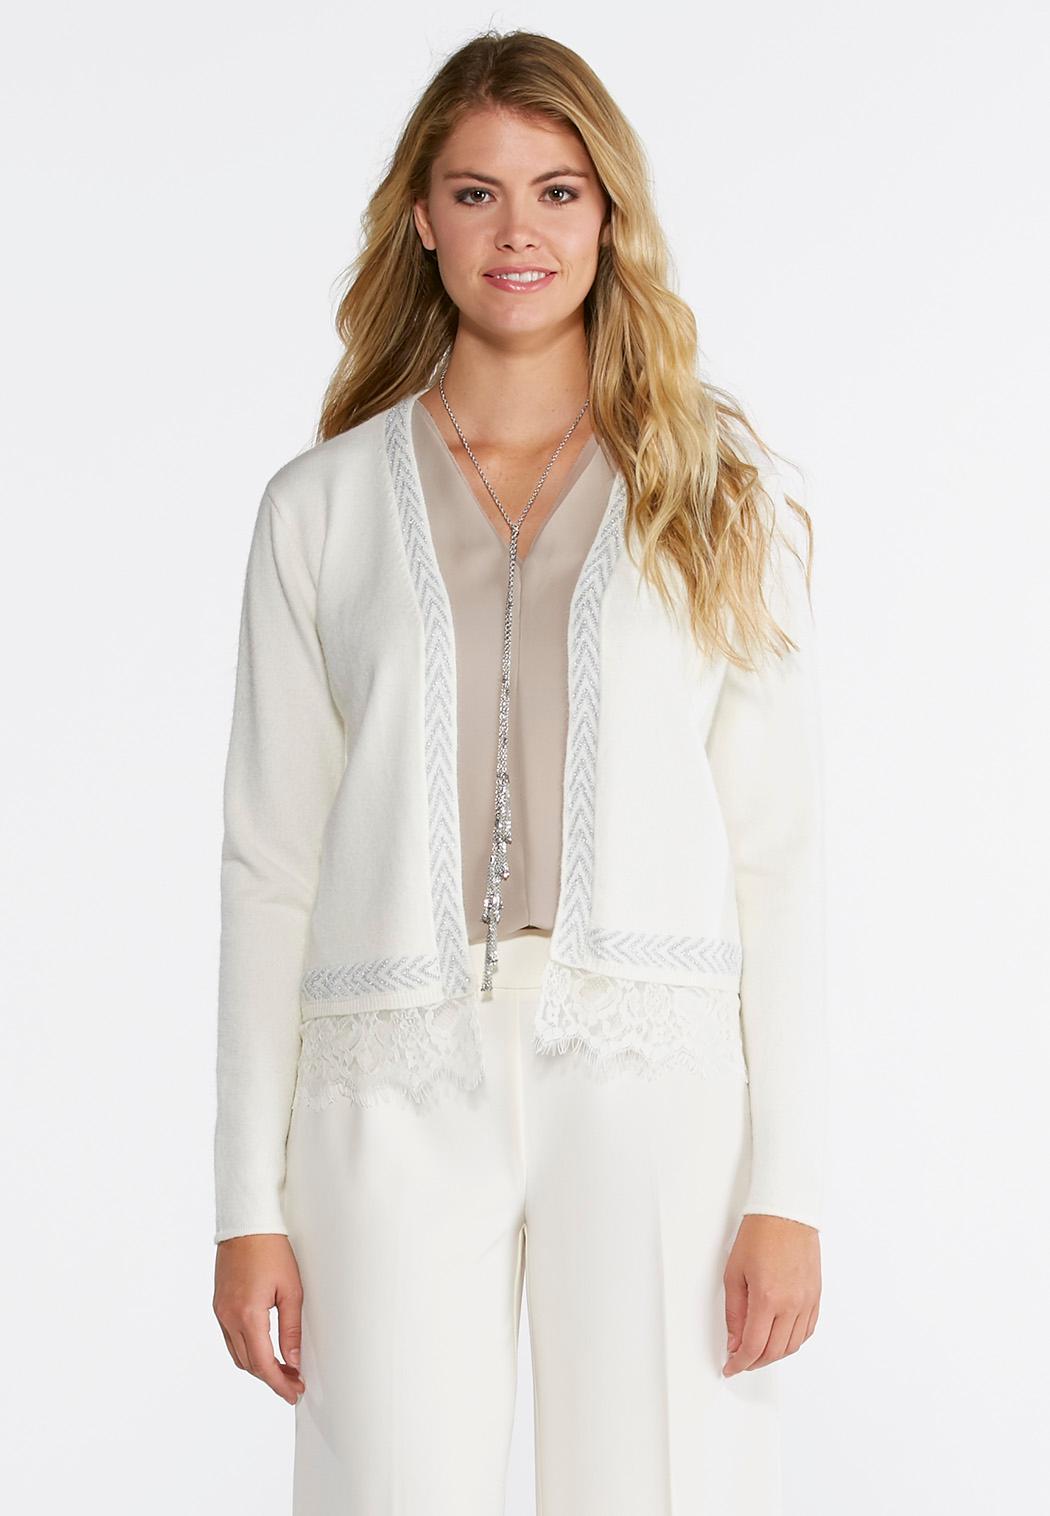 Lace Trim Cardigan-Plus Cardigans & Shrugs Cato Fashions